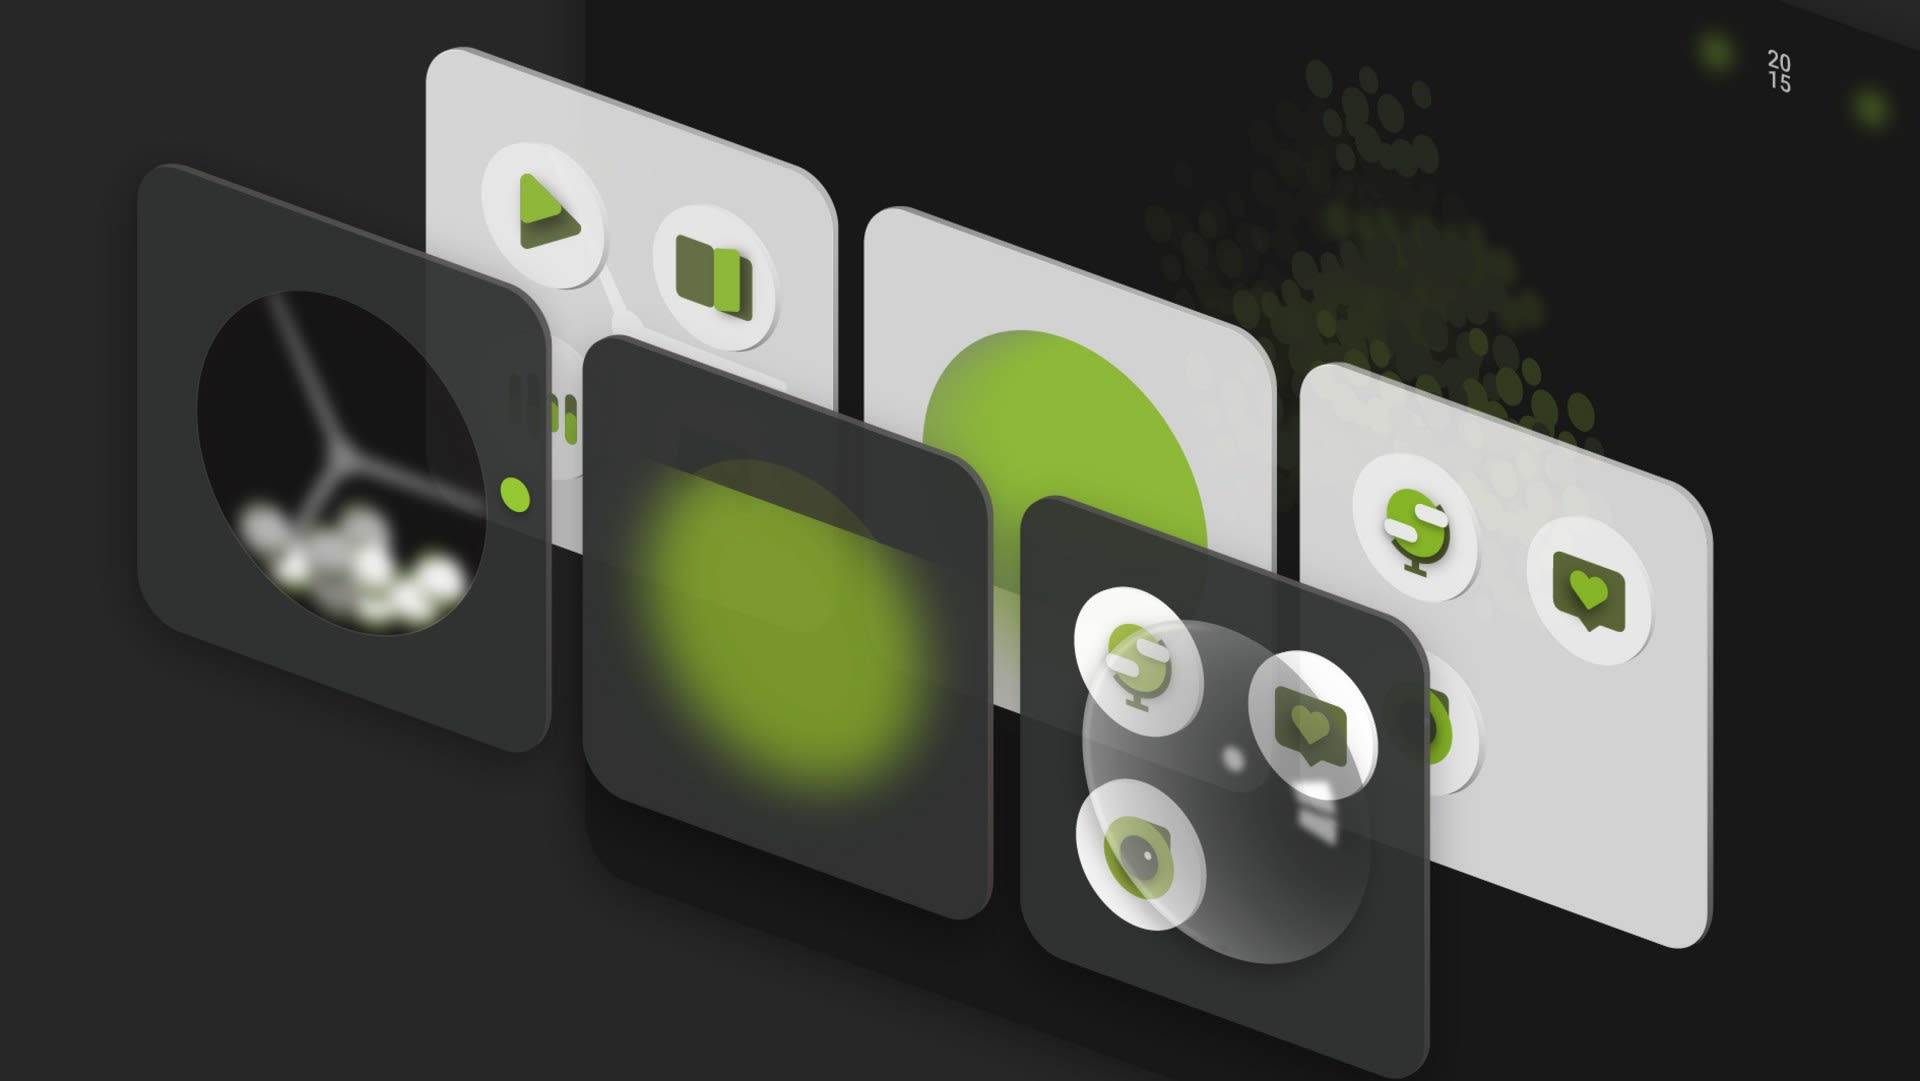 Onlign OS: Home Screen